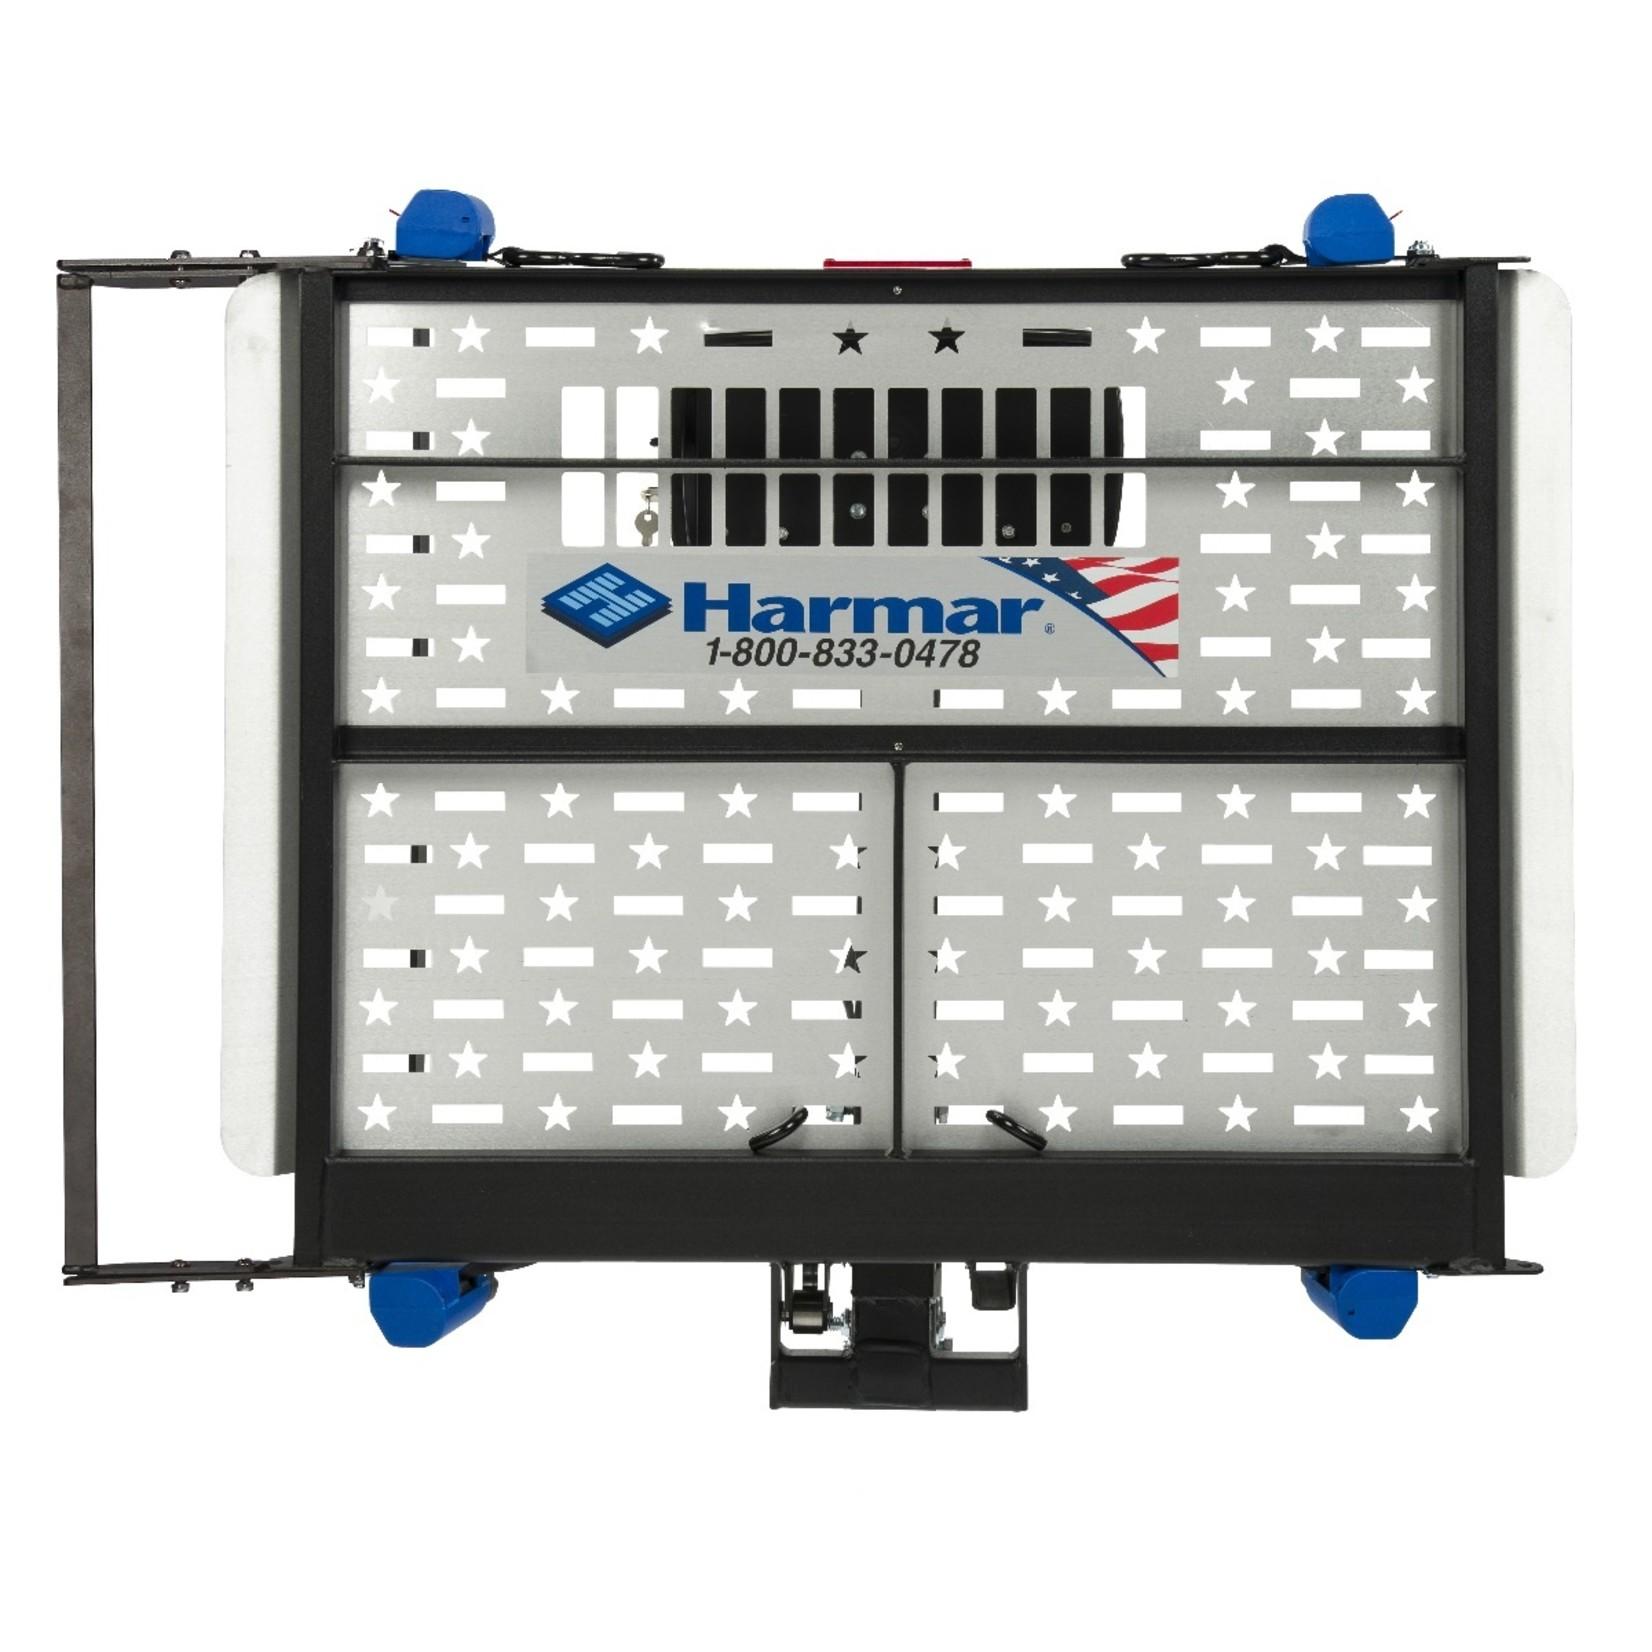 Harmar Mobility AL301XLHD Heavy-Duty Extra Large Fusion Lift